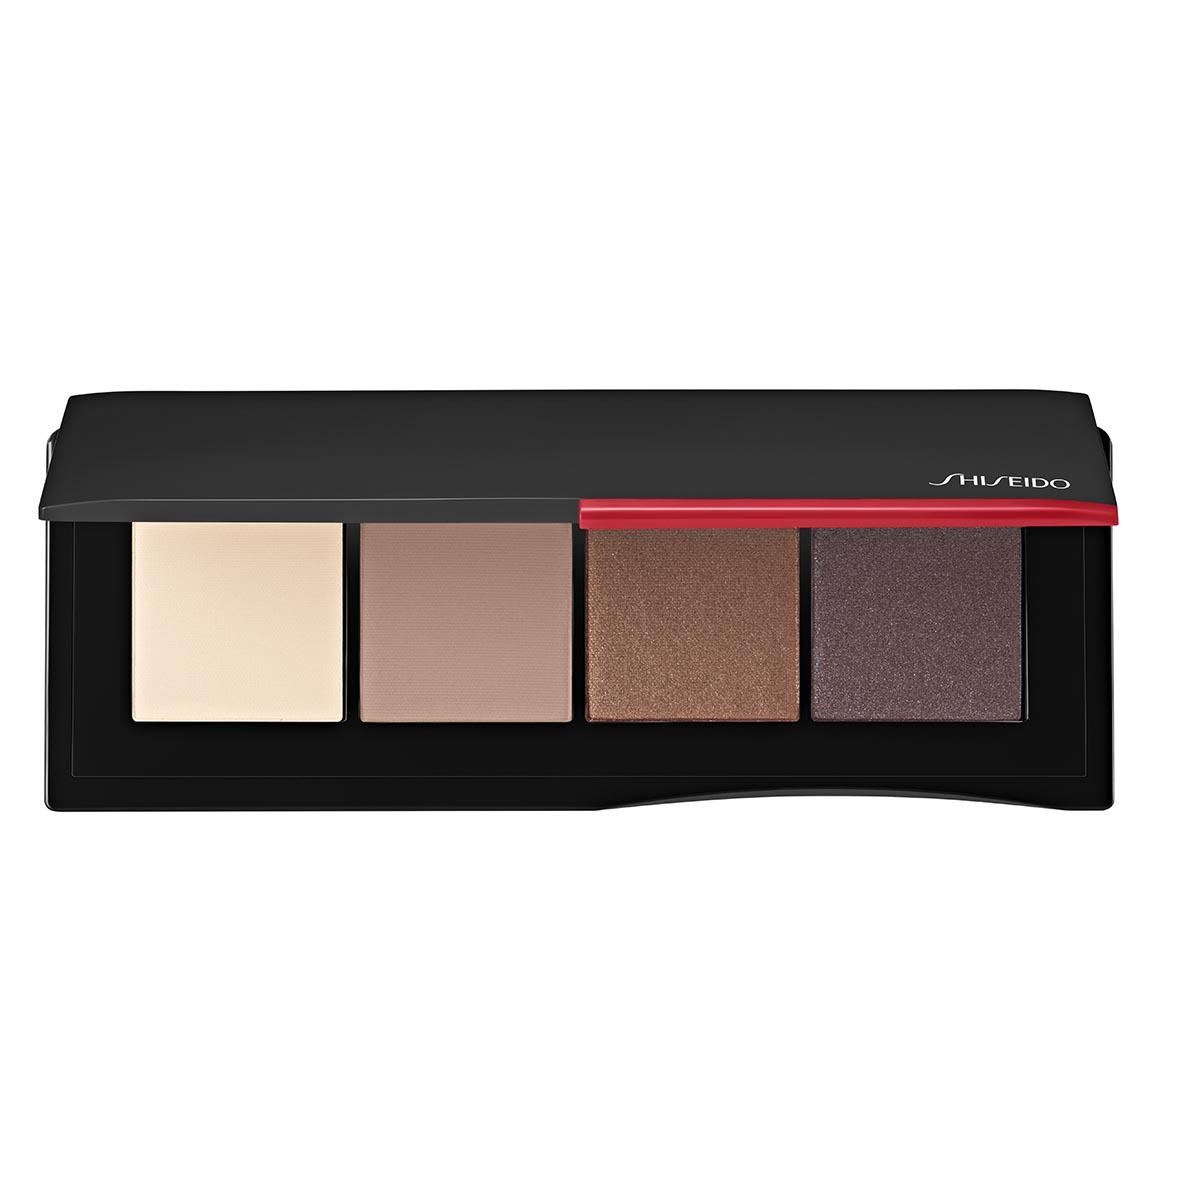 Shiseido essentialist eye palette 05